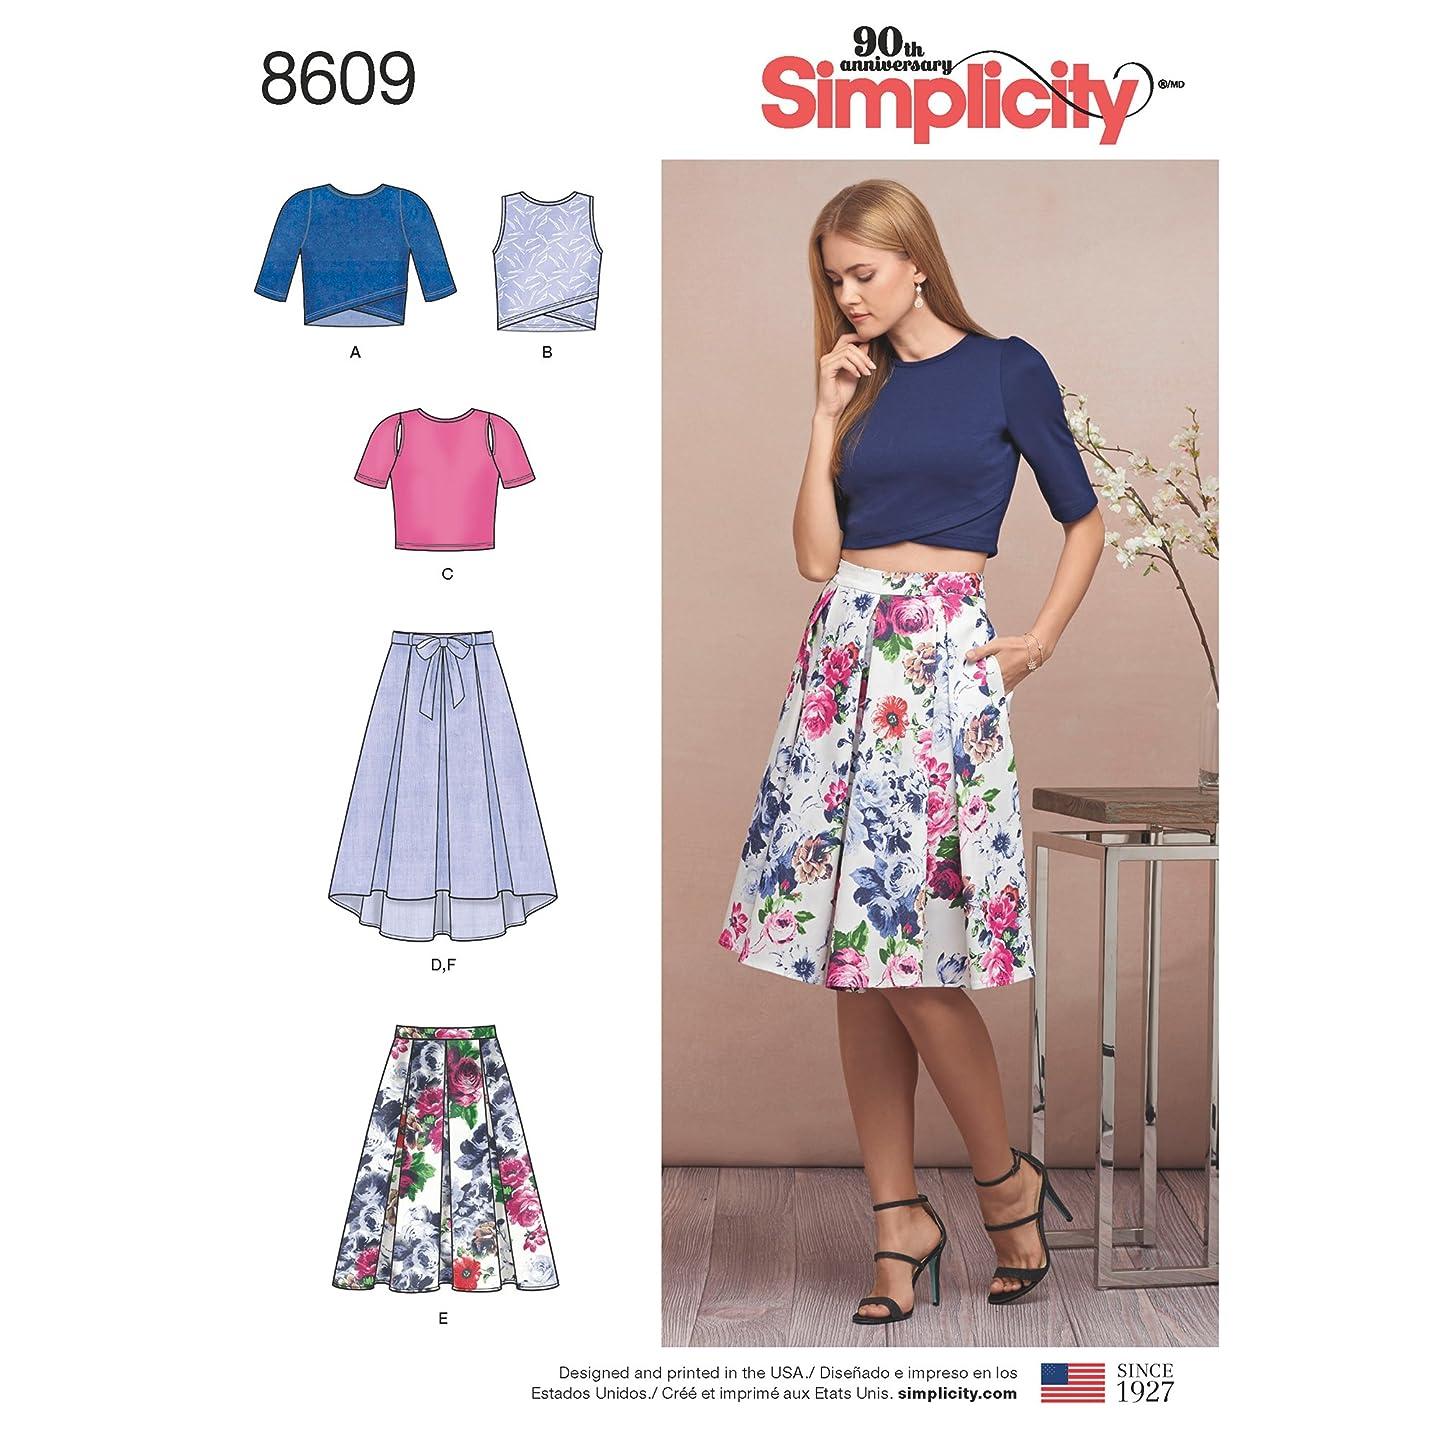 Simplicity Creative Patterns US8609D5 Dresses